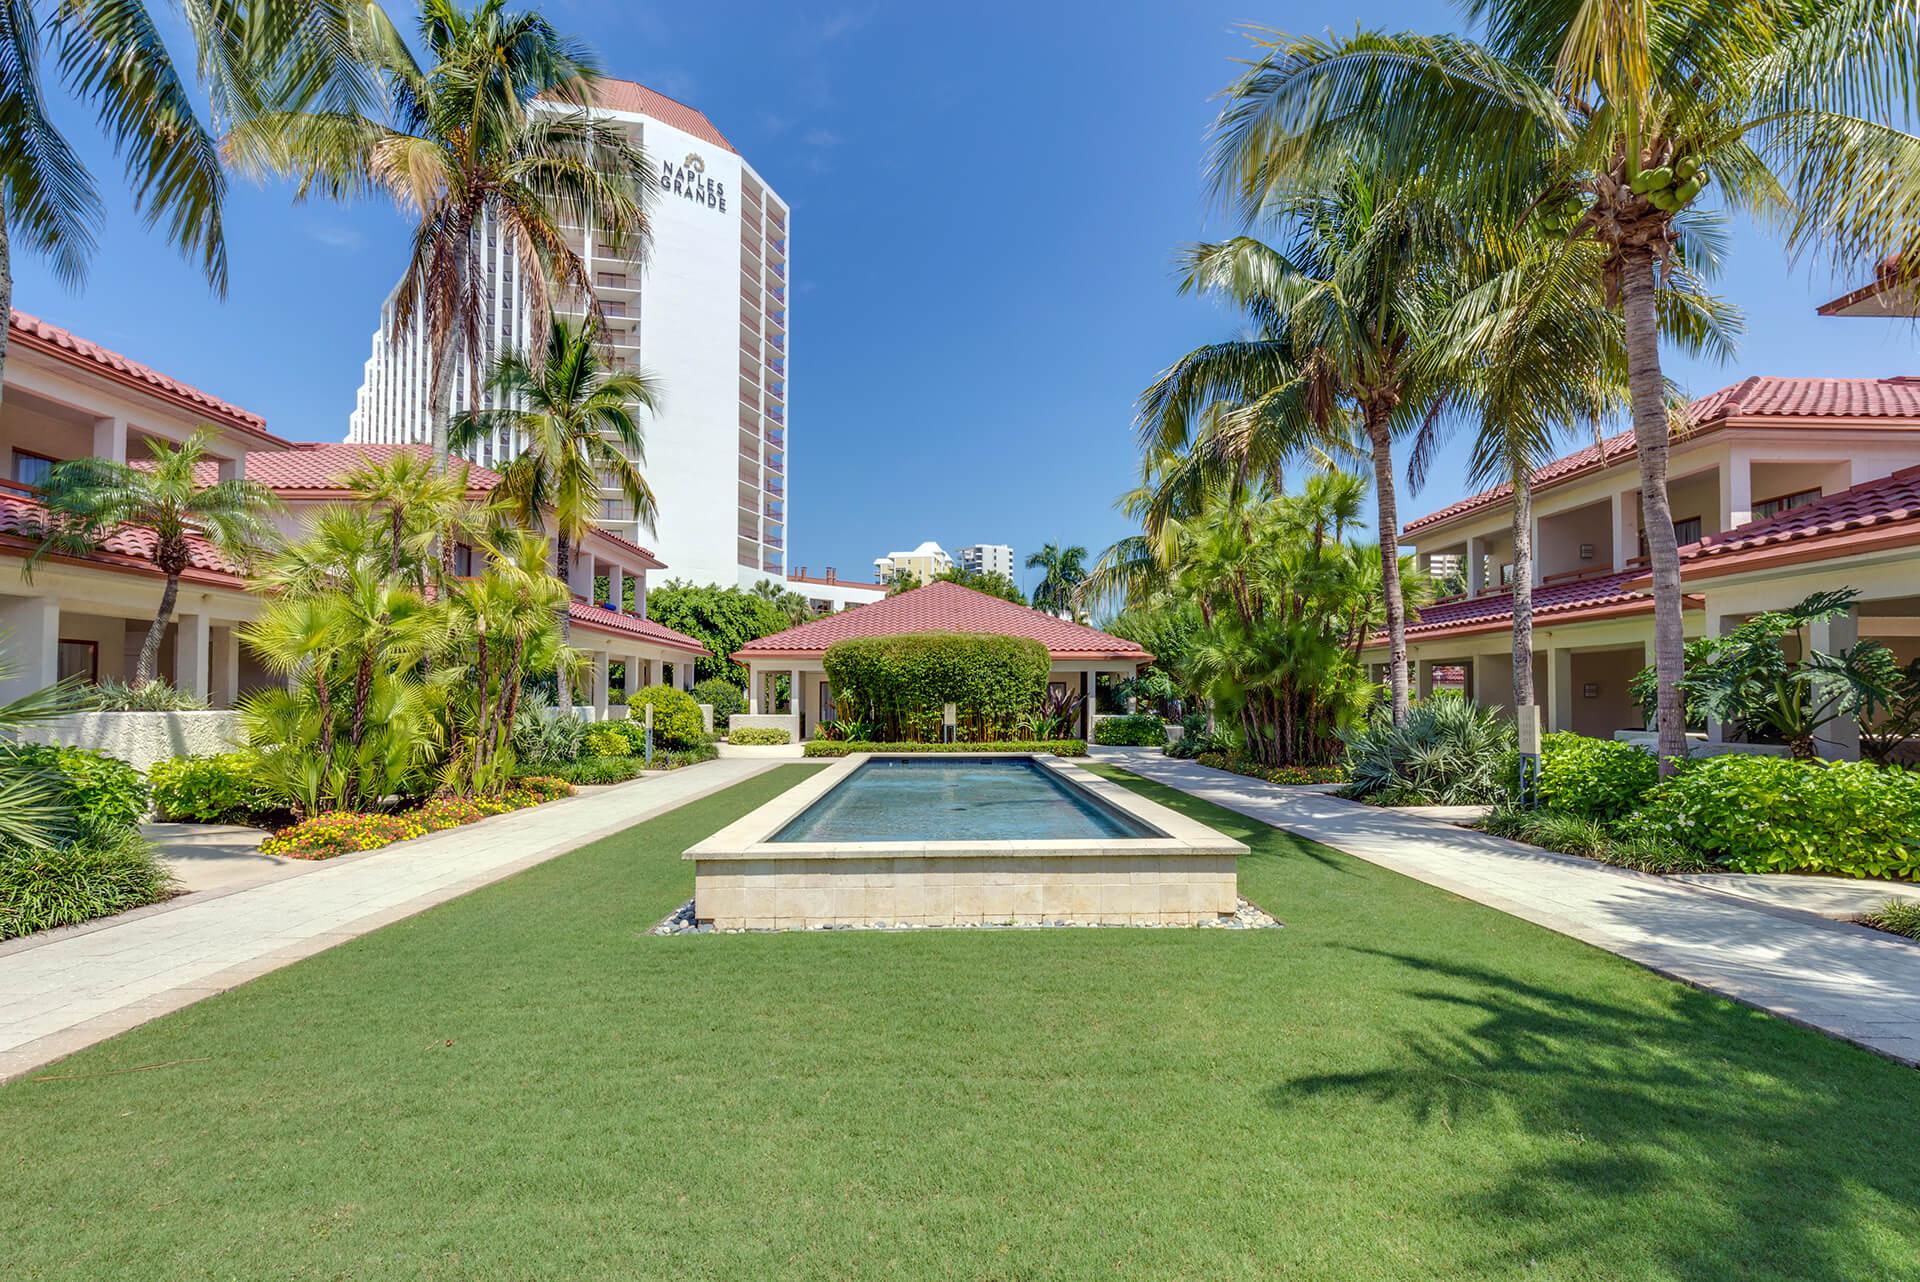 Naples Beach Hotel Florida Room